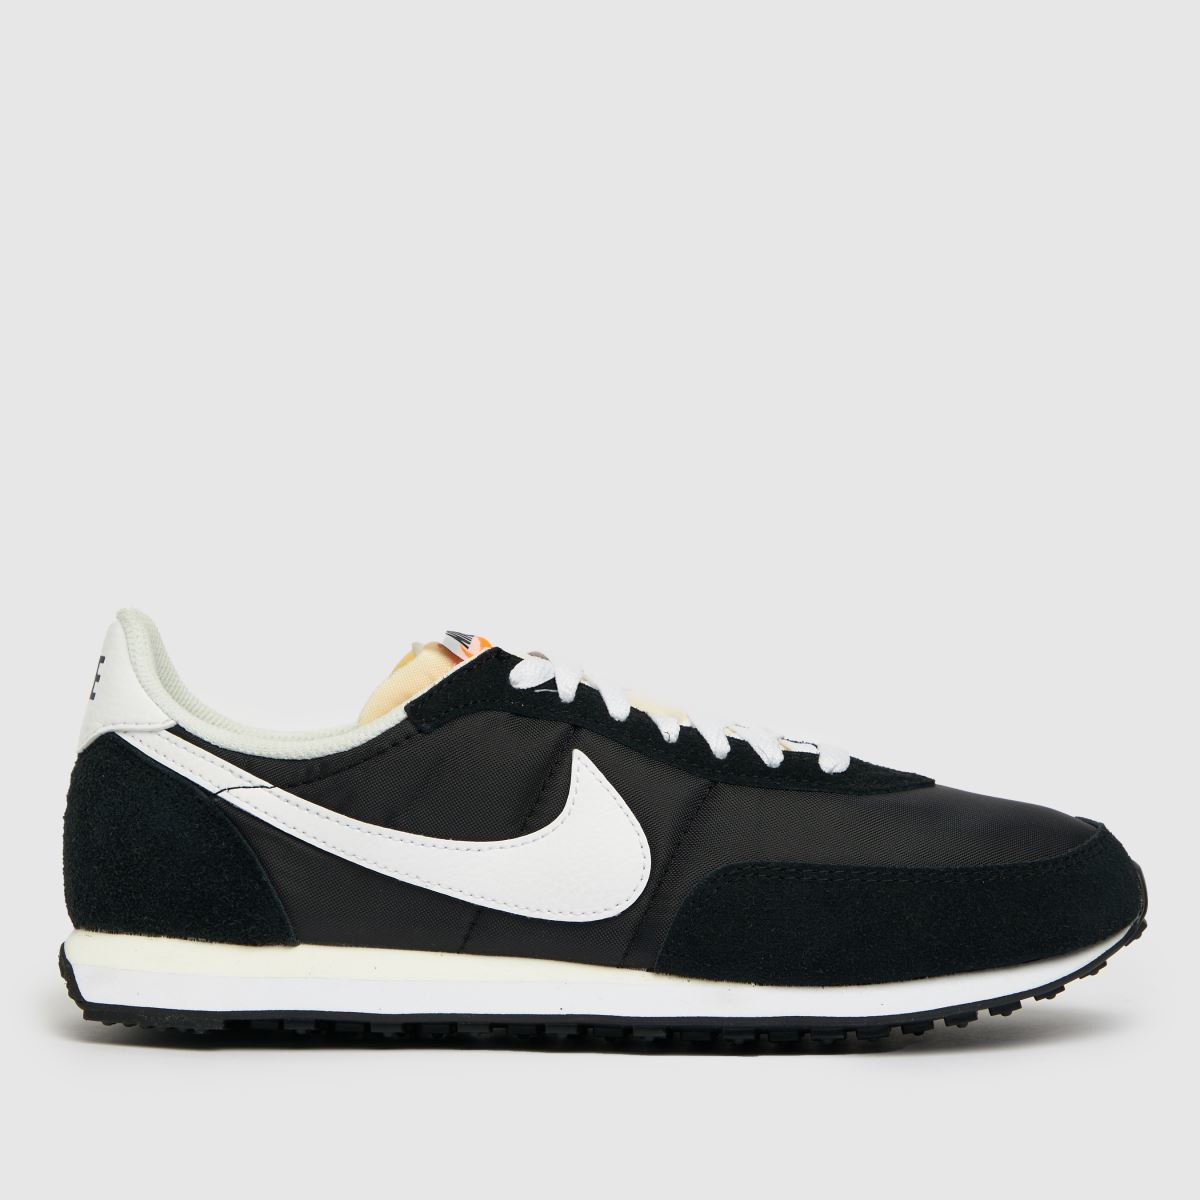 Nike Black & White Waffle 2 Trainers